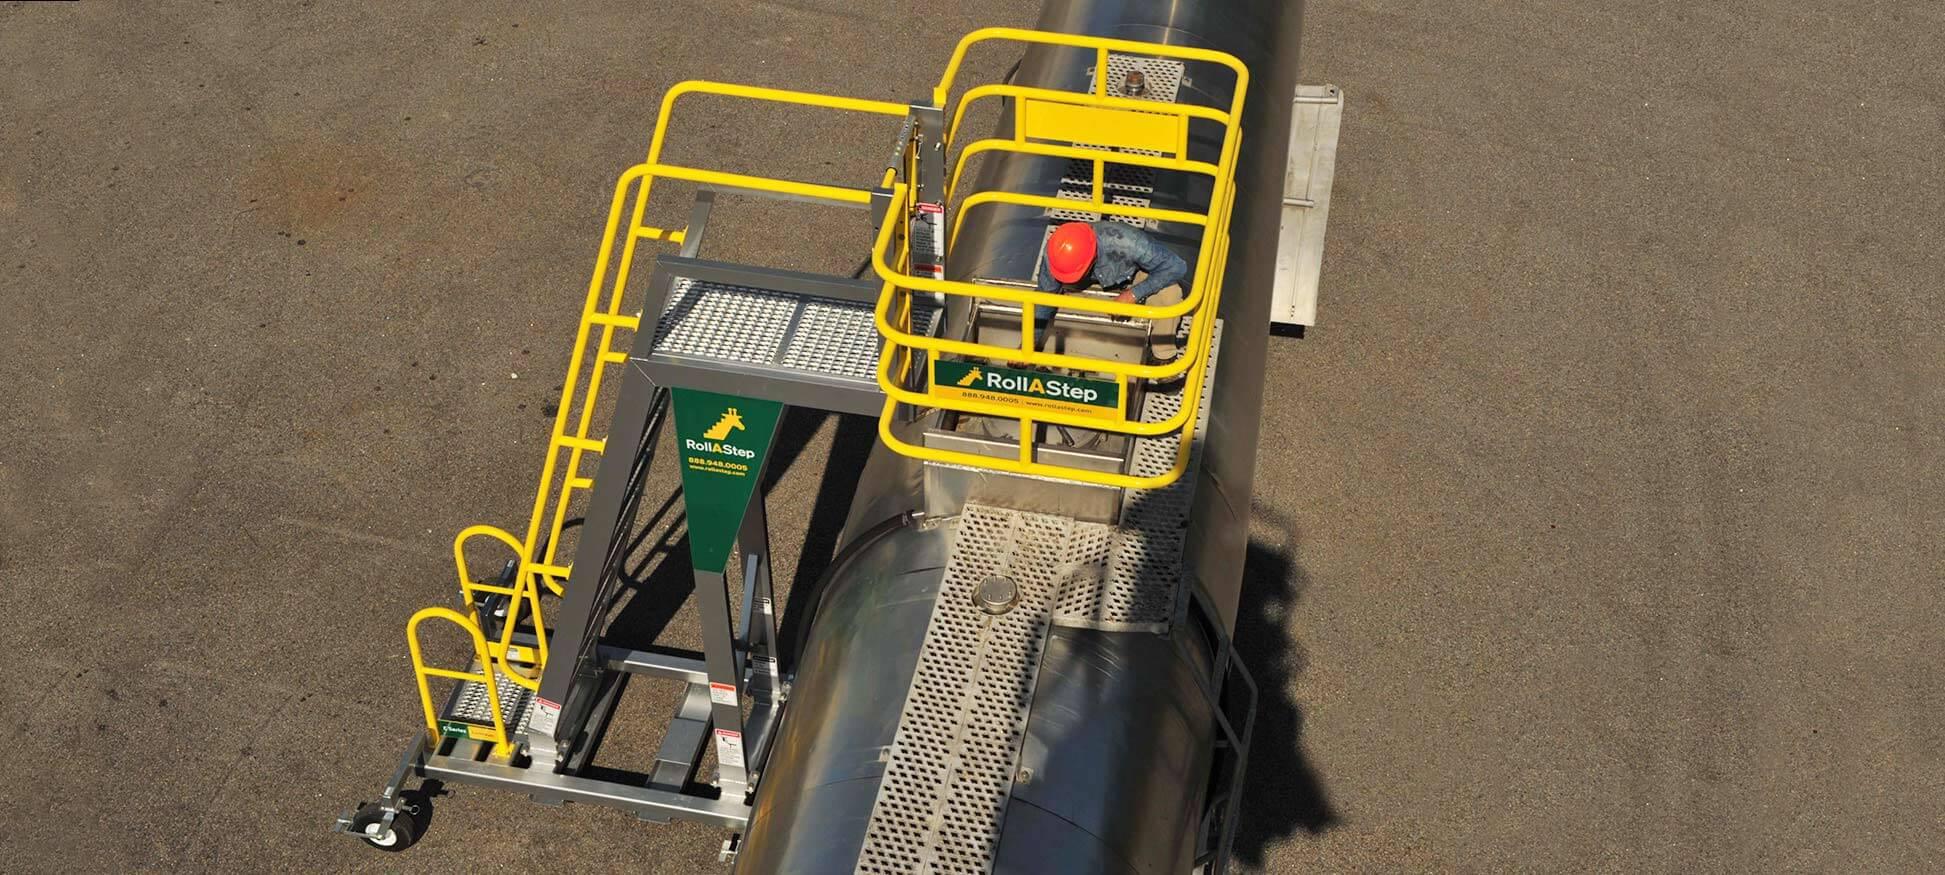 mobile staircase_overtankertruck